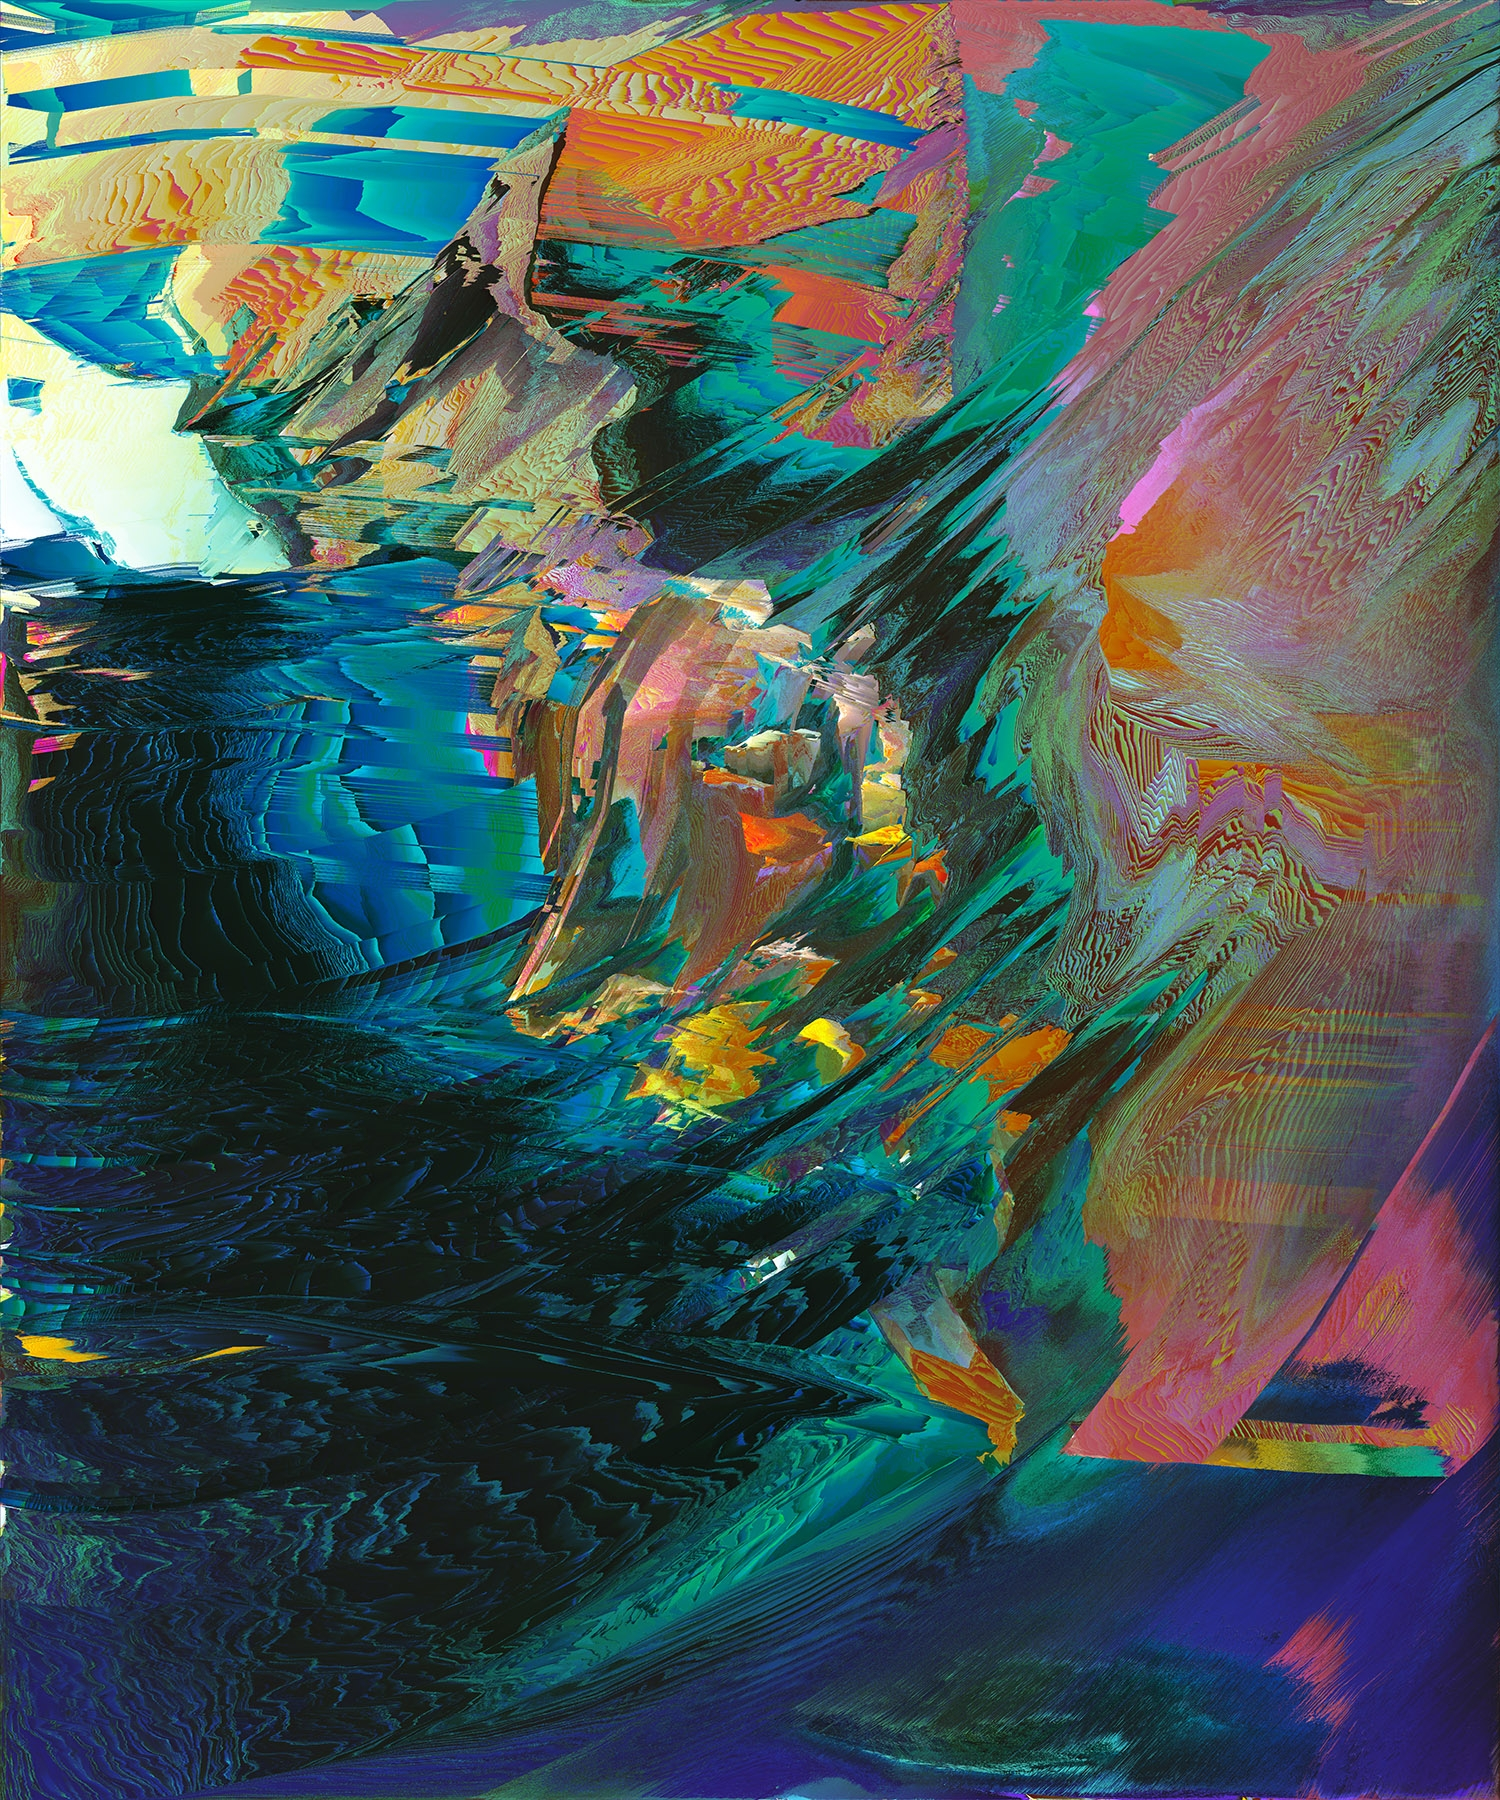 abstract, digitalart, glitch - amnonowed | ello